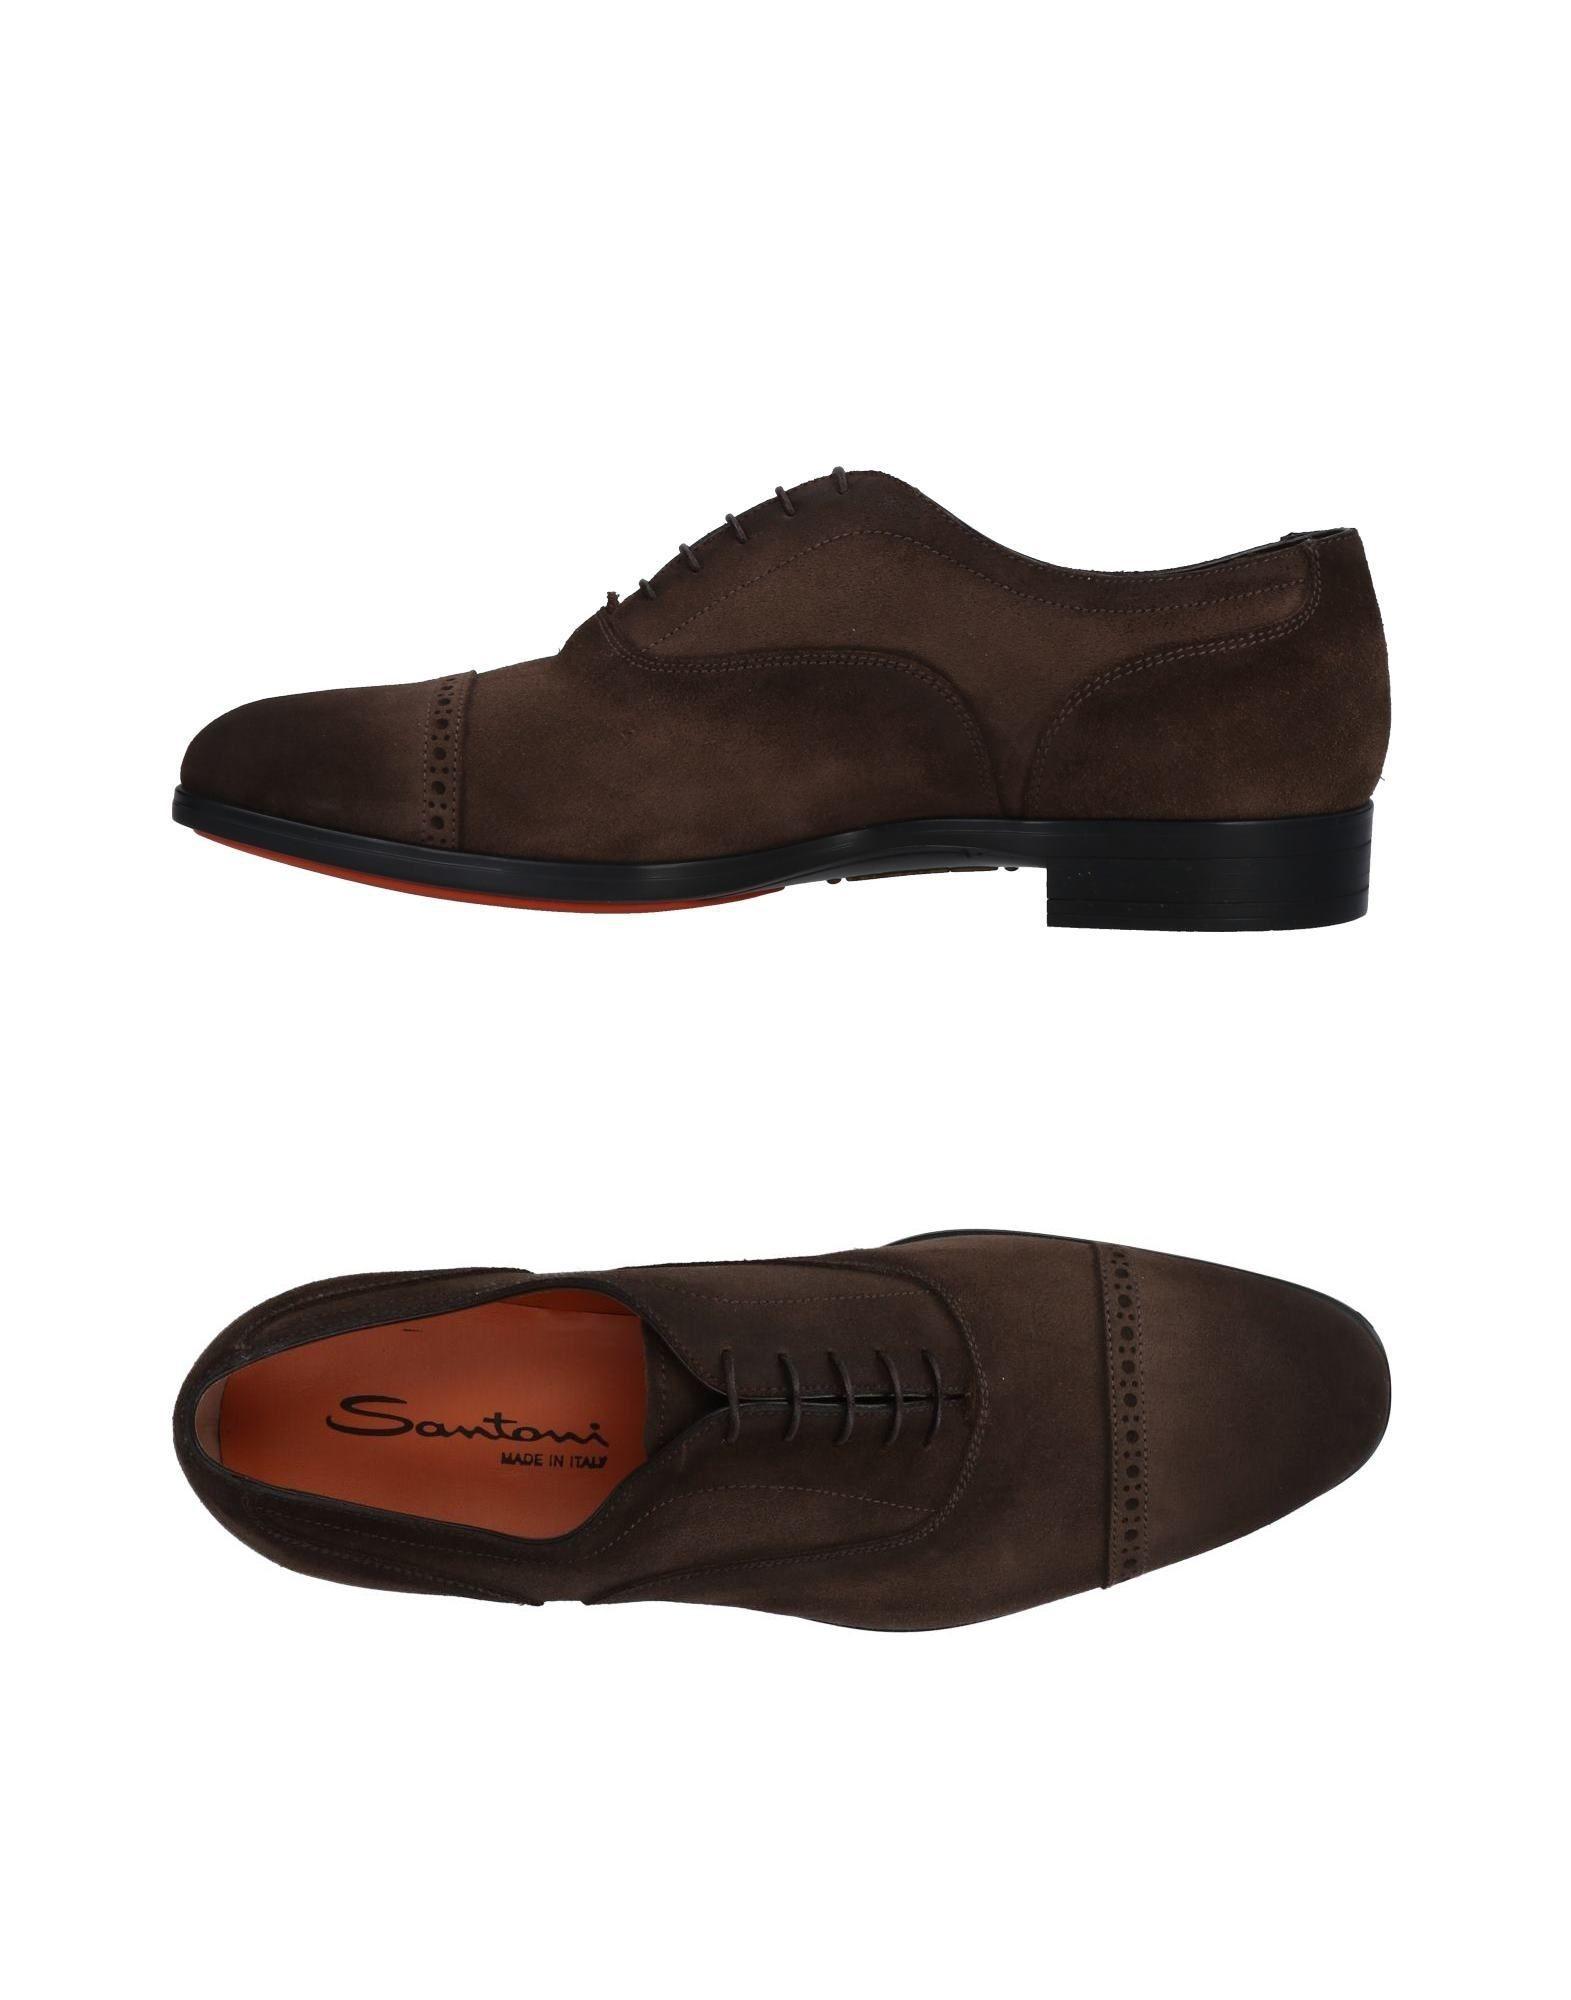 Santoni Schnürschuhe Herren  11478790OP Gute Qualität beliebte Schuhe